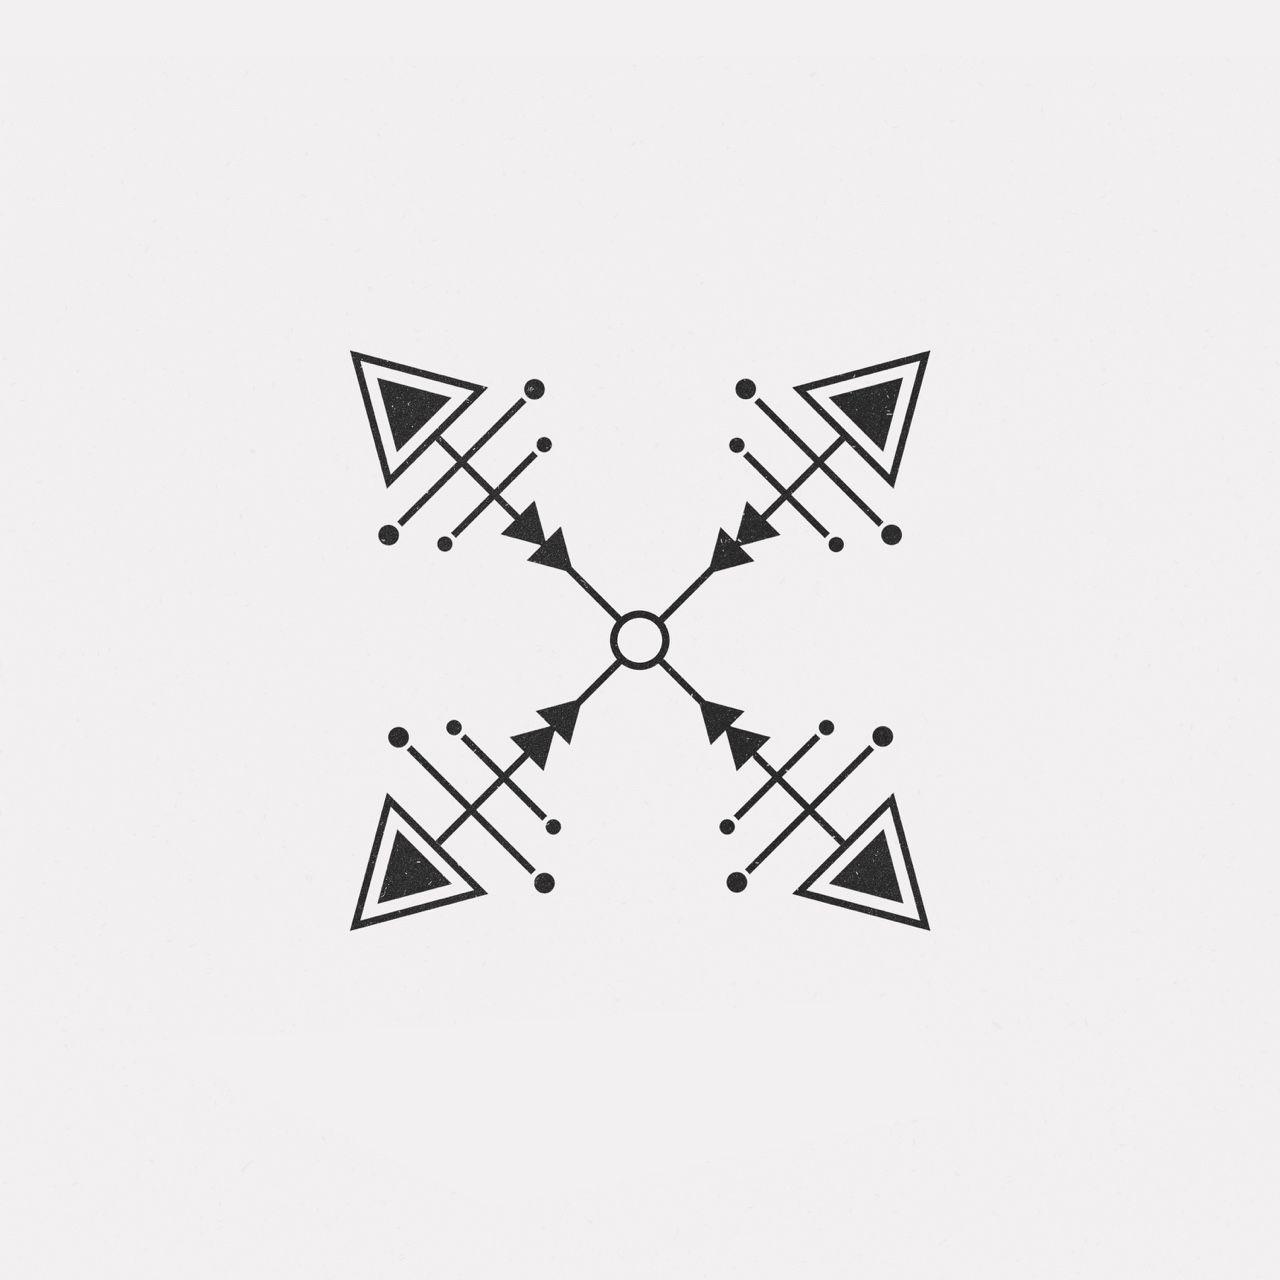 Daily Minimal || #JU16-613 || A new geometric design every day. | All | Tattoo designs, Tattoos ...